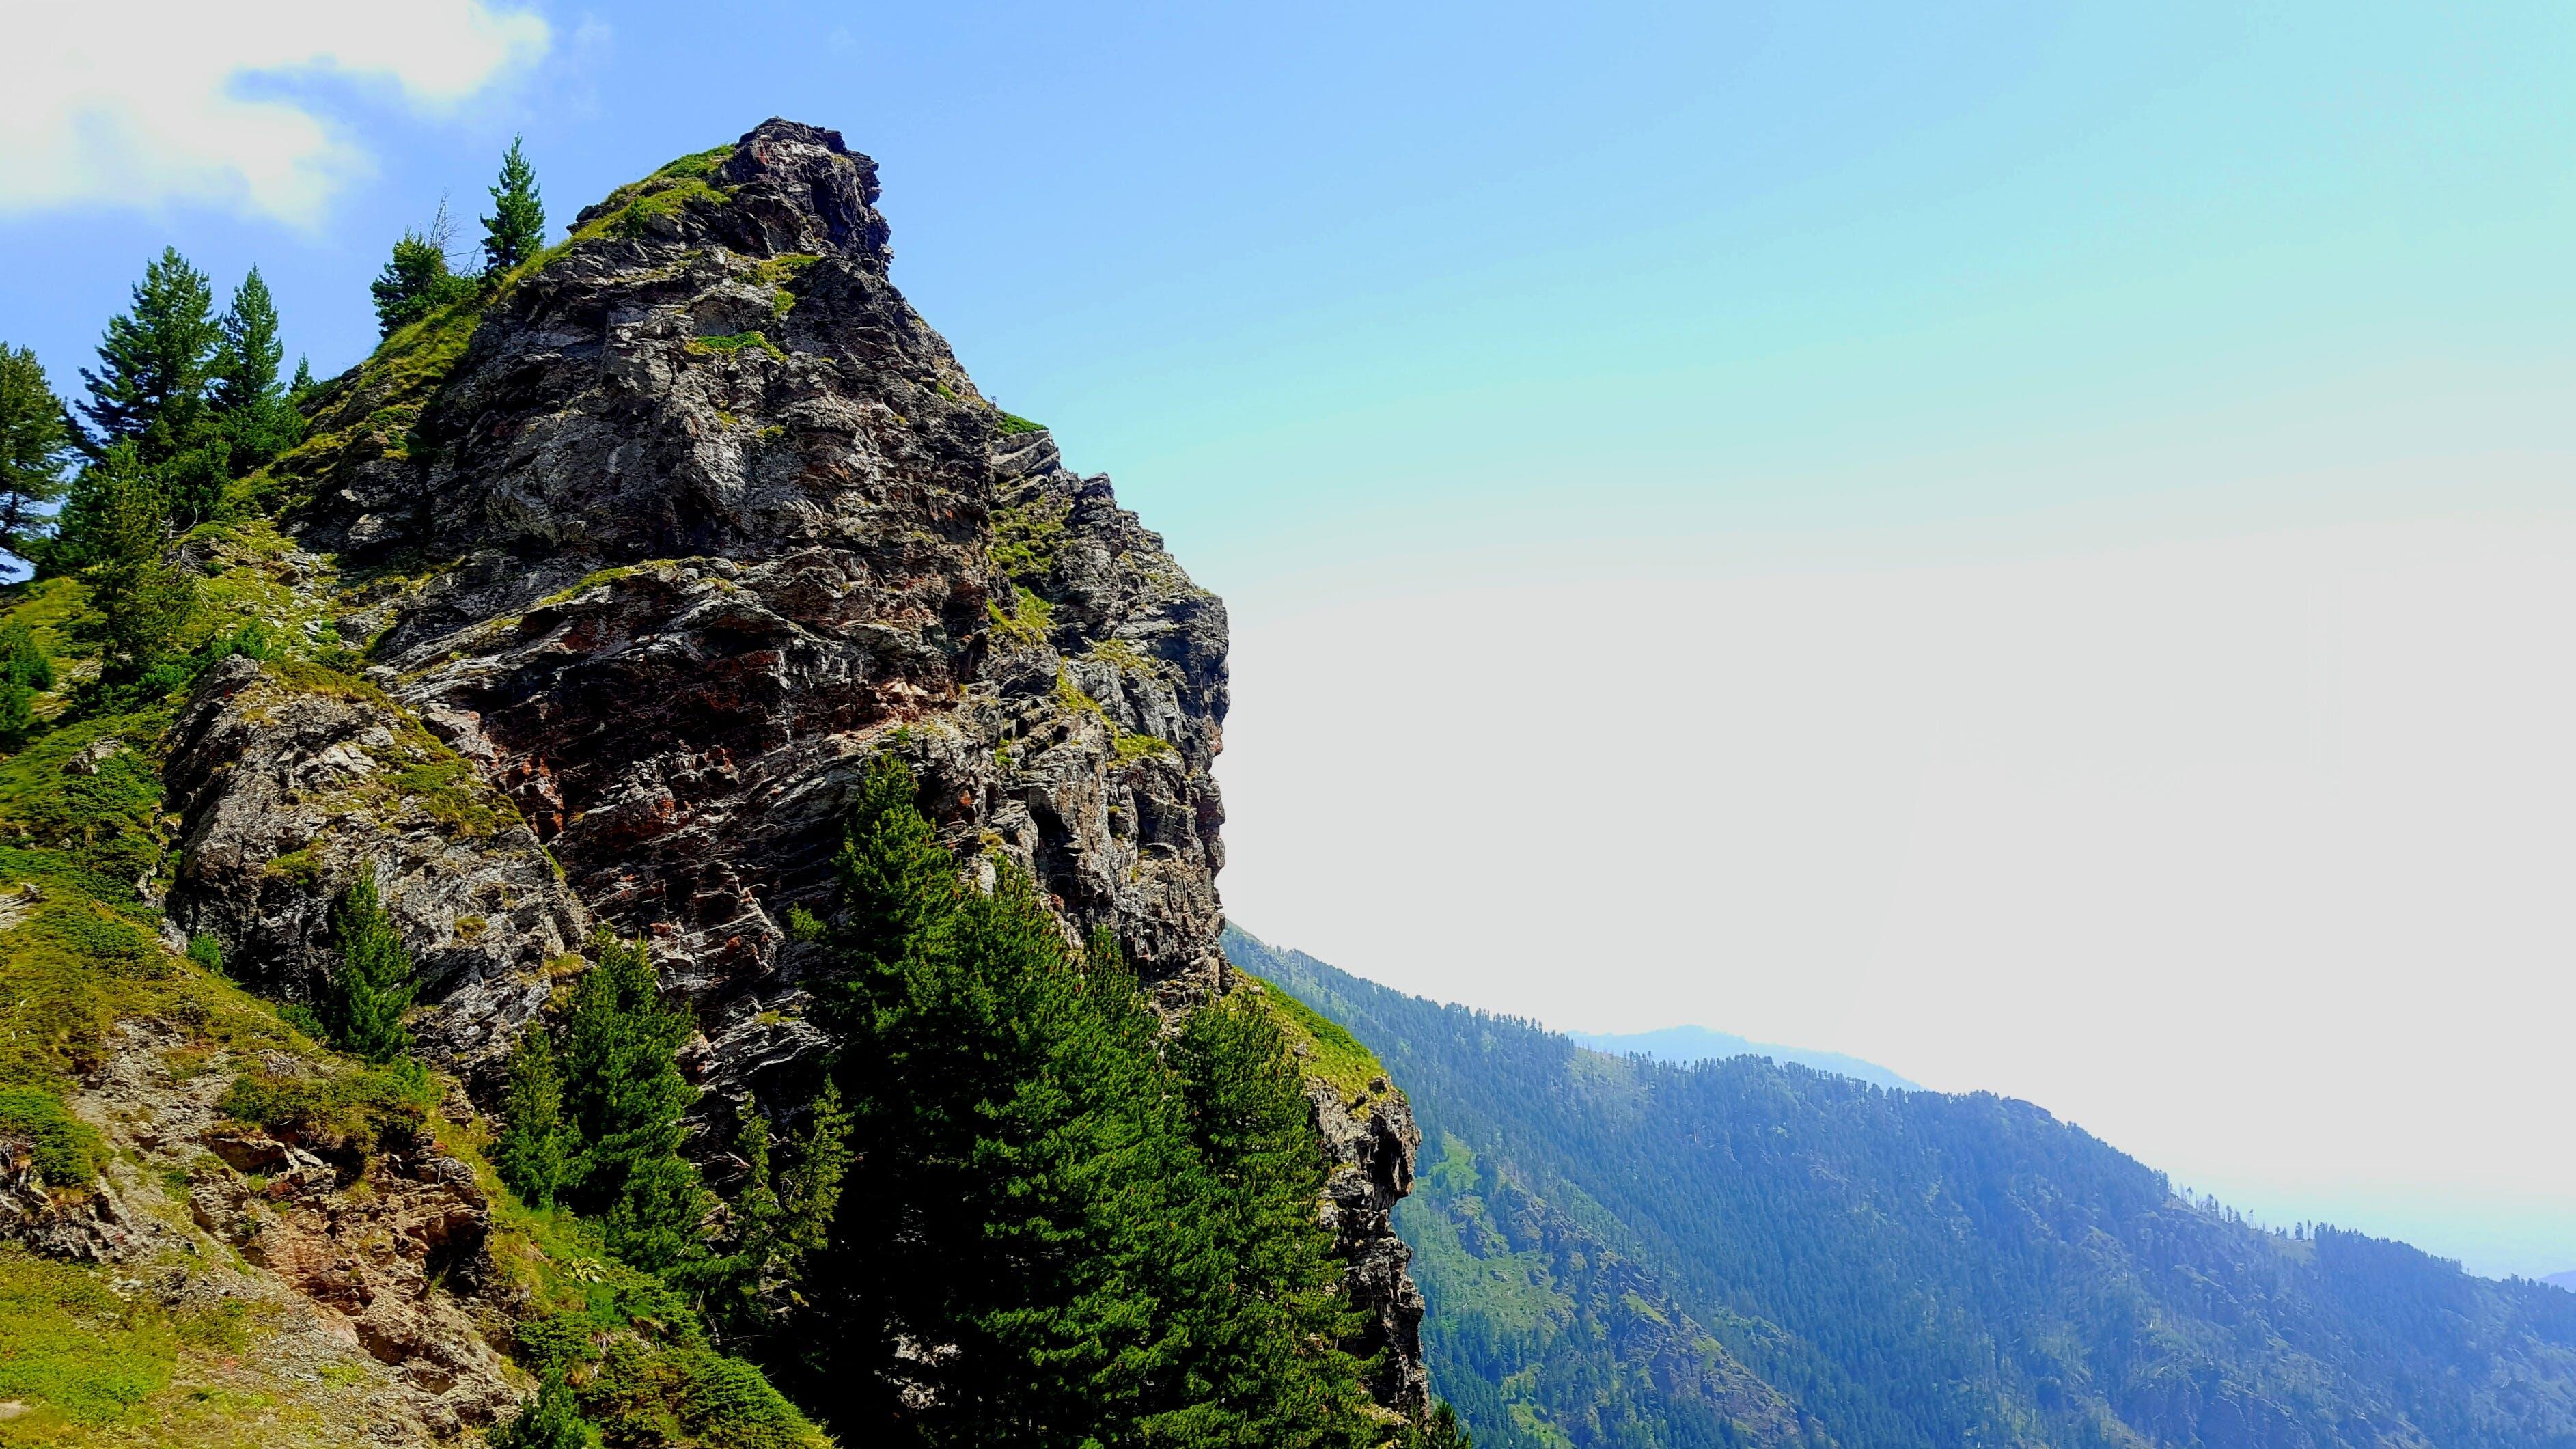 Green Grass Mountain Photo